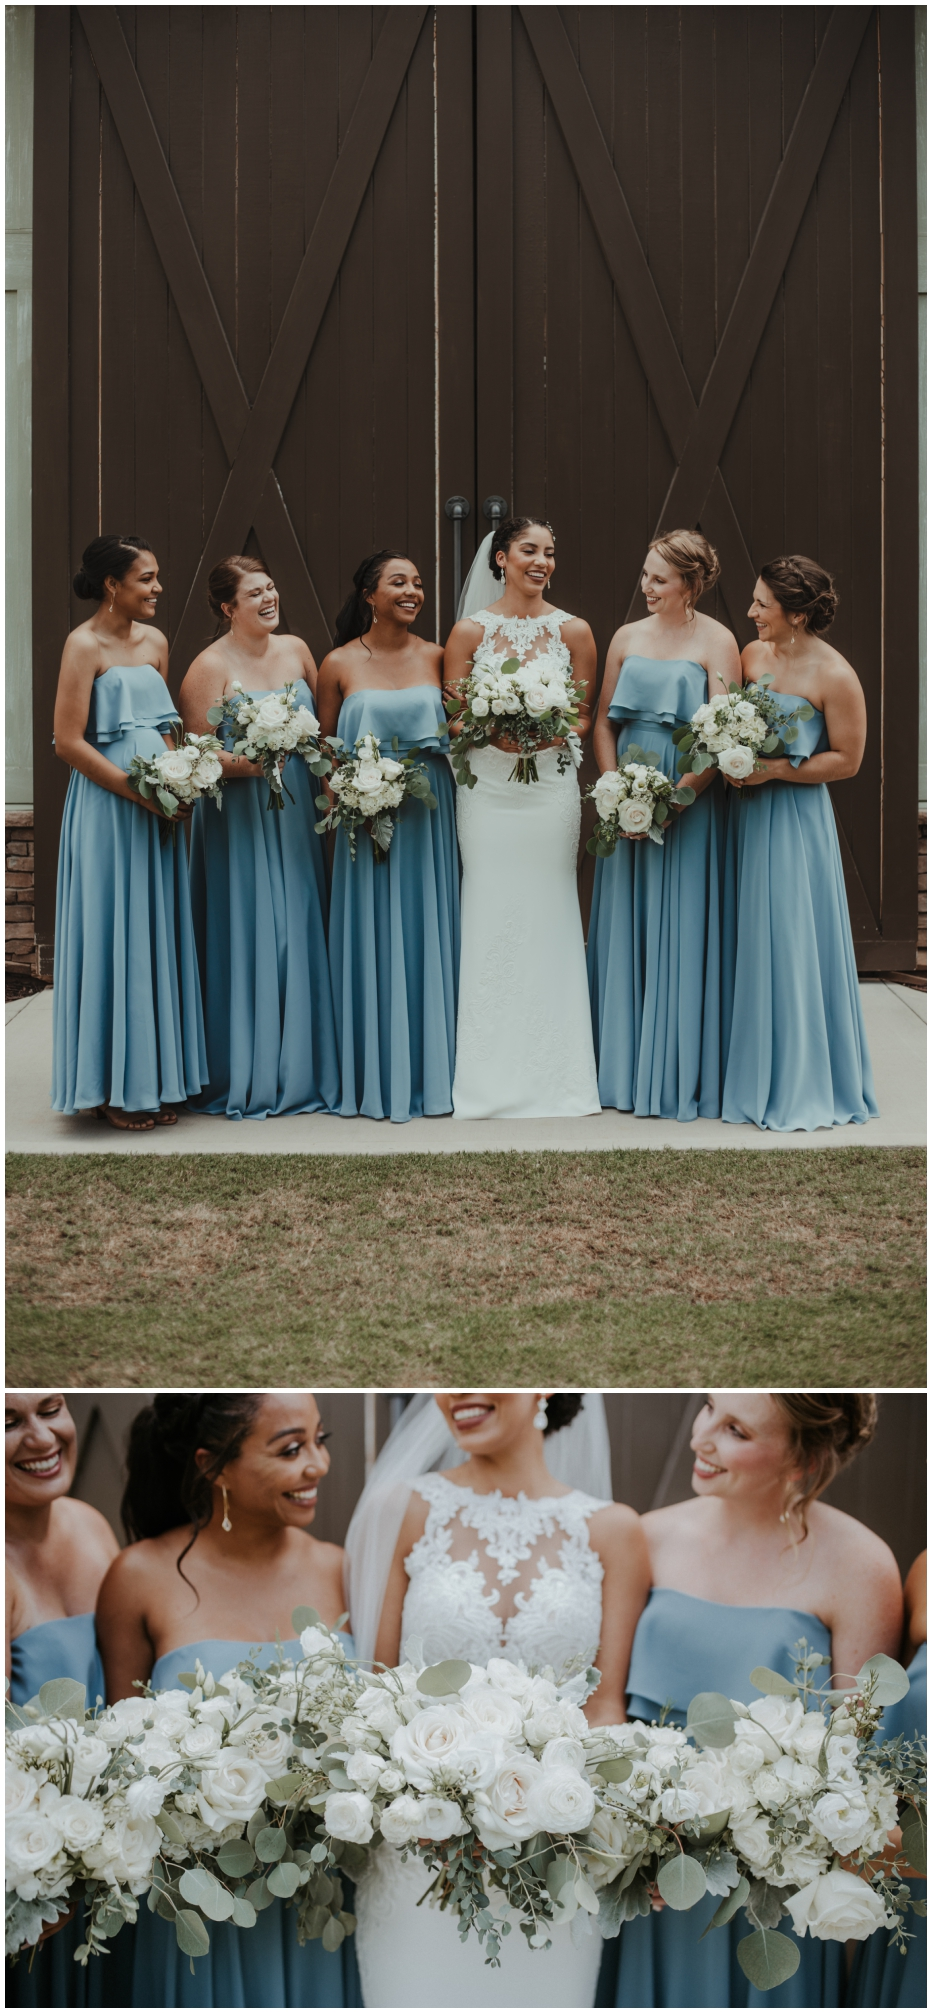 Posh-Moments-Photography-NC- Wedding-Photographer-Rolling-Hills-Farms-Wedding-Monroe-NC-Charlotte-NC_0247.jpg